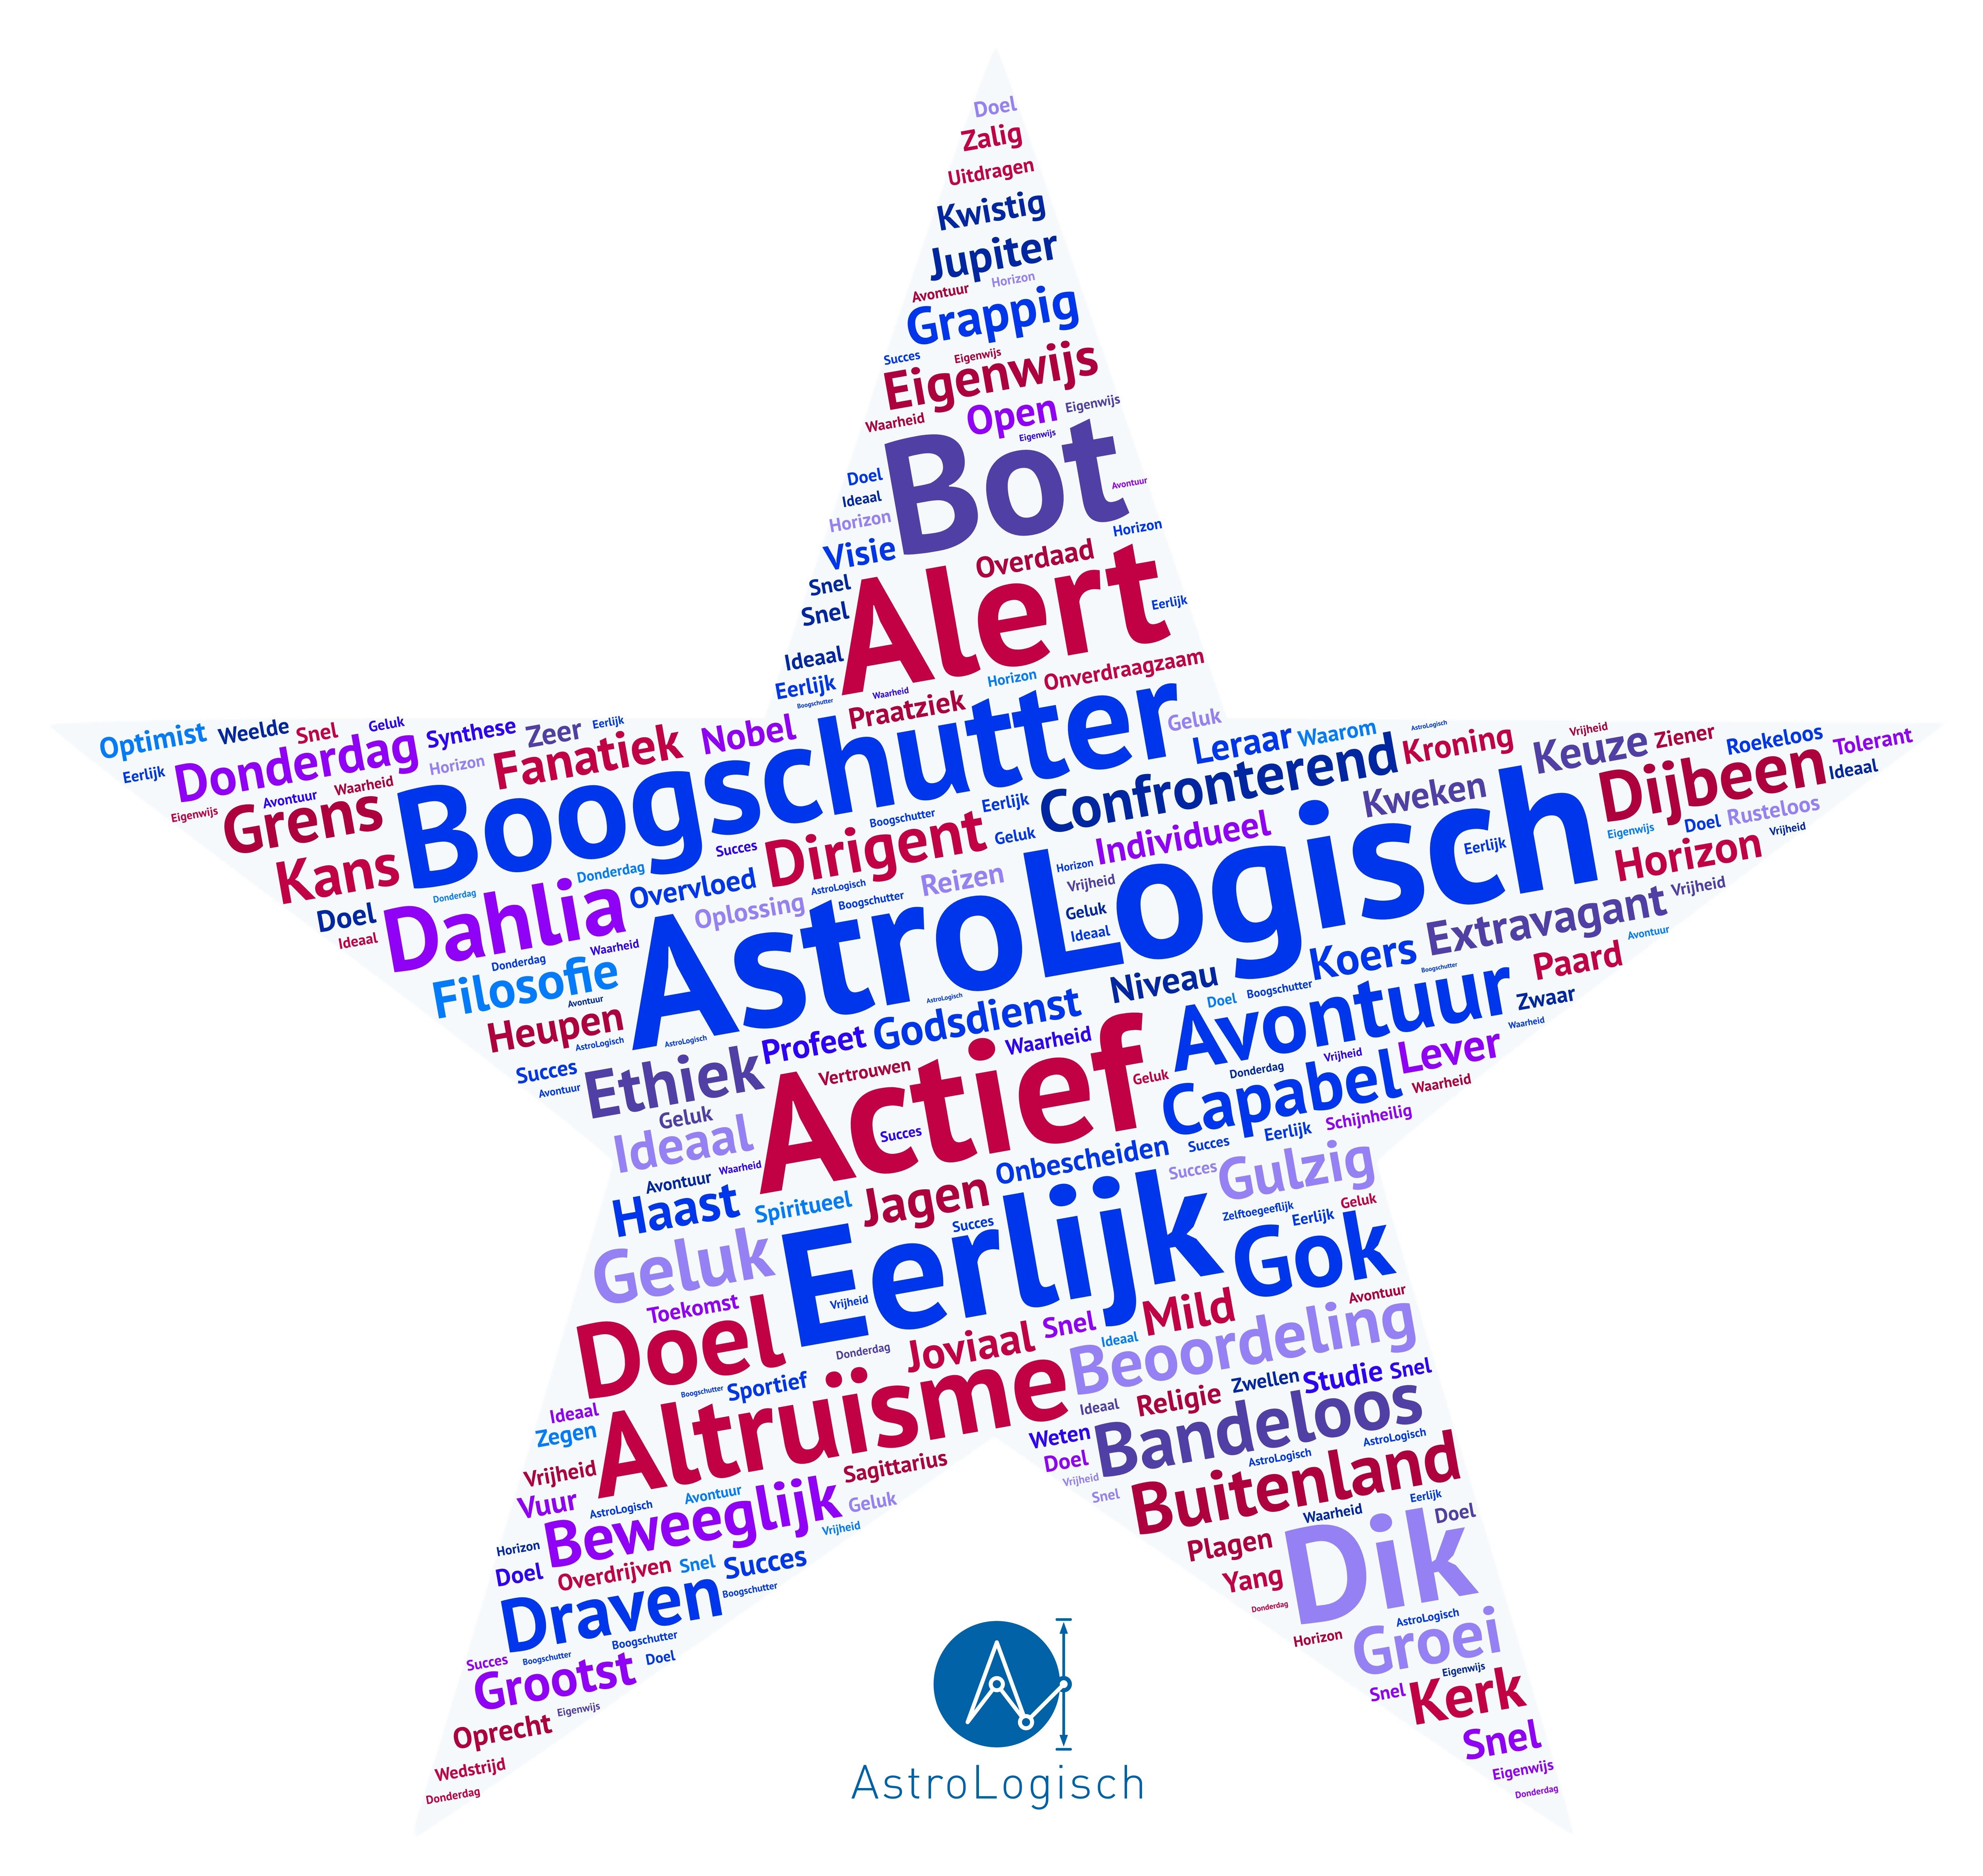 Ster van A tot Z Boogschutter, AstroLogisch, astrologie, horoscoop, sterrenbeeld,